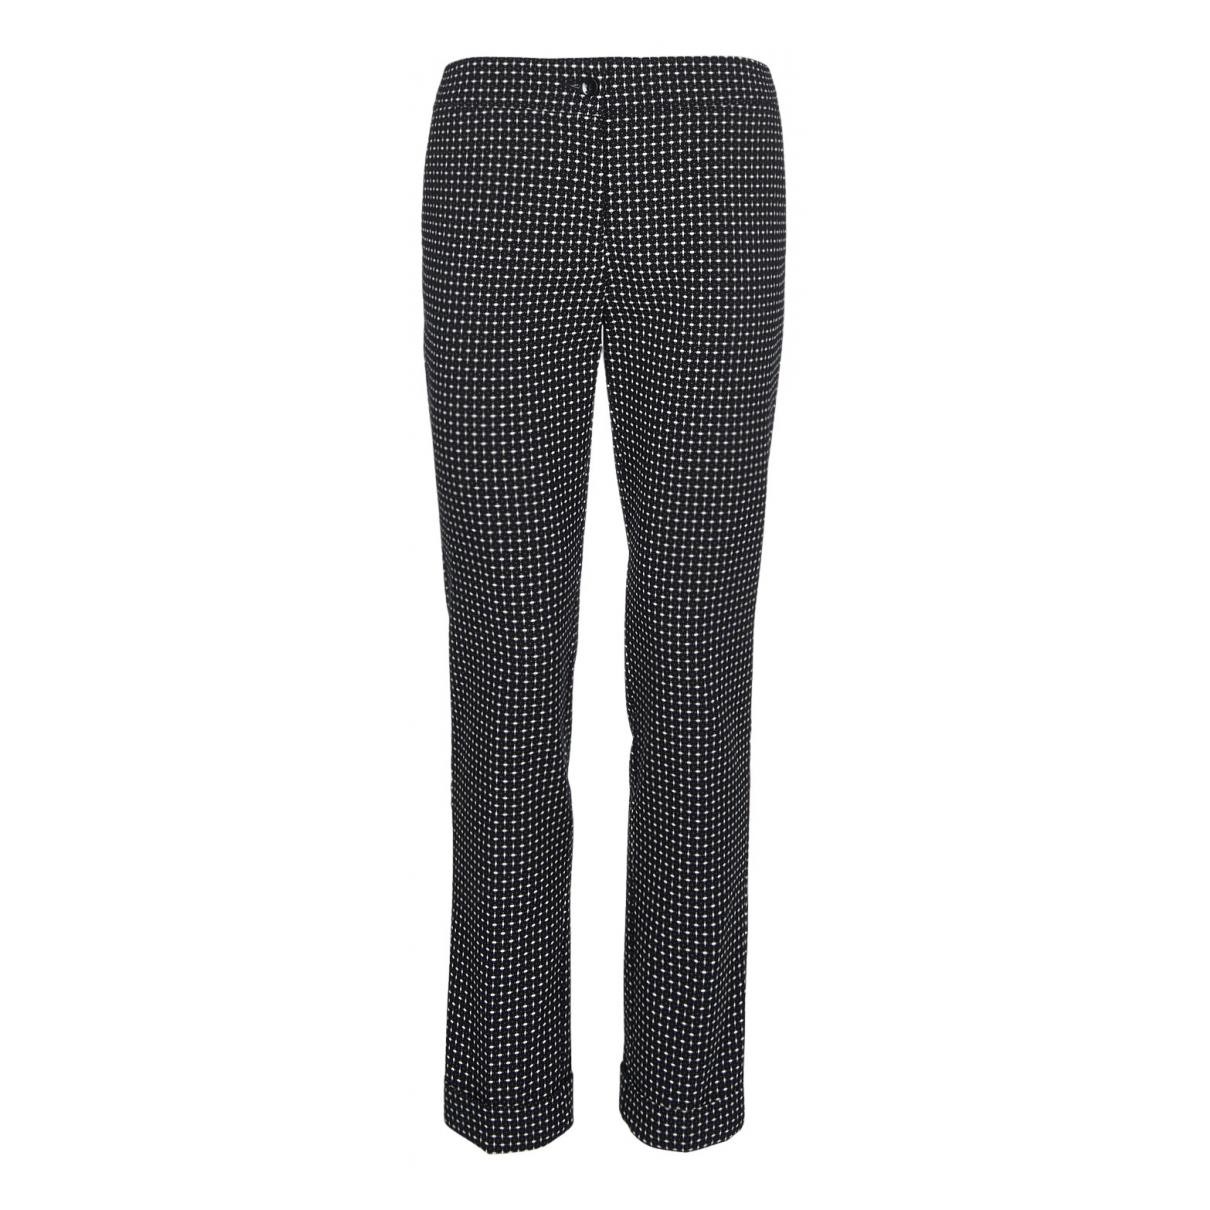 Etro N Multicolour Cotton Trousers for Women 8 UK